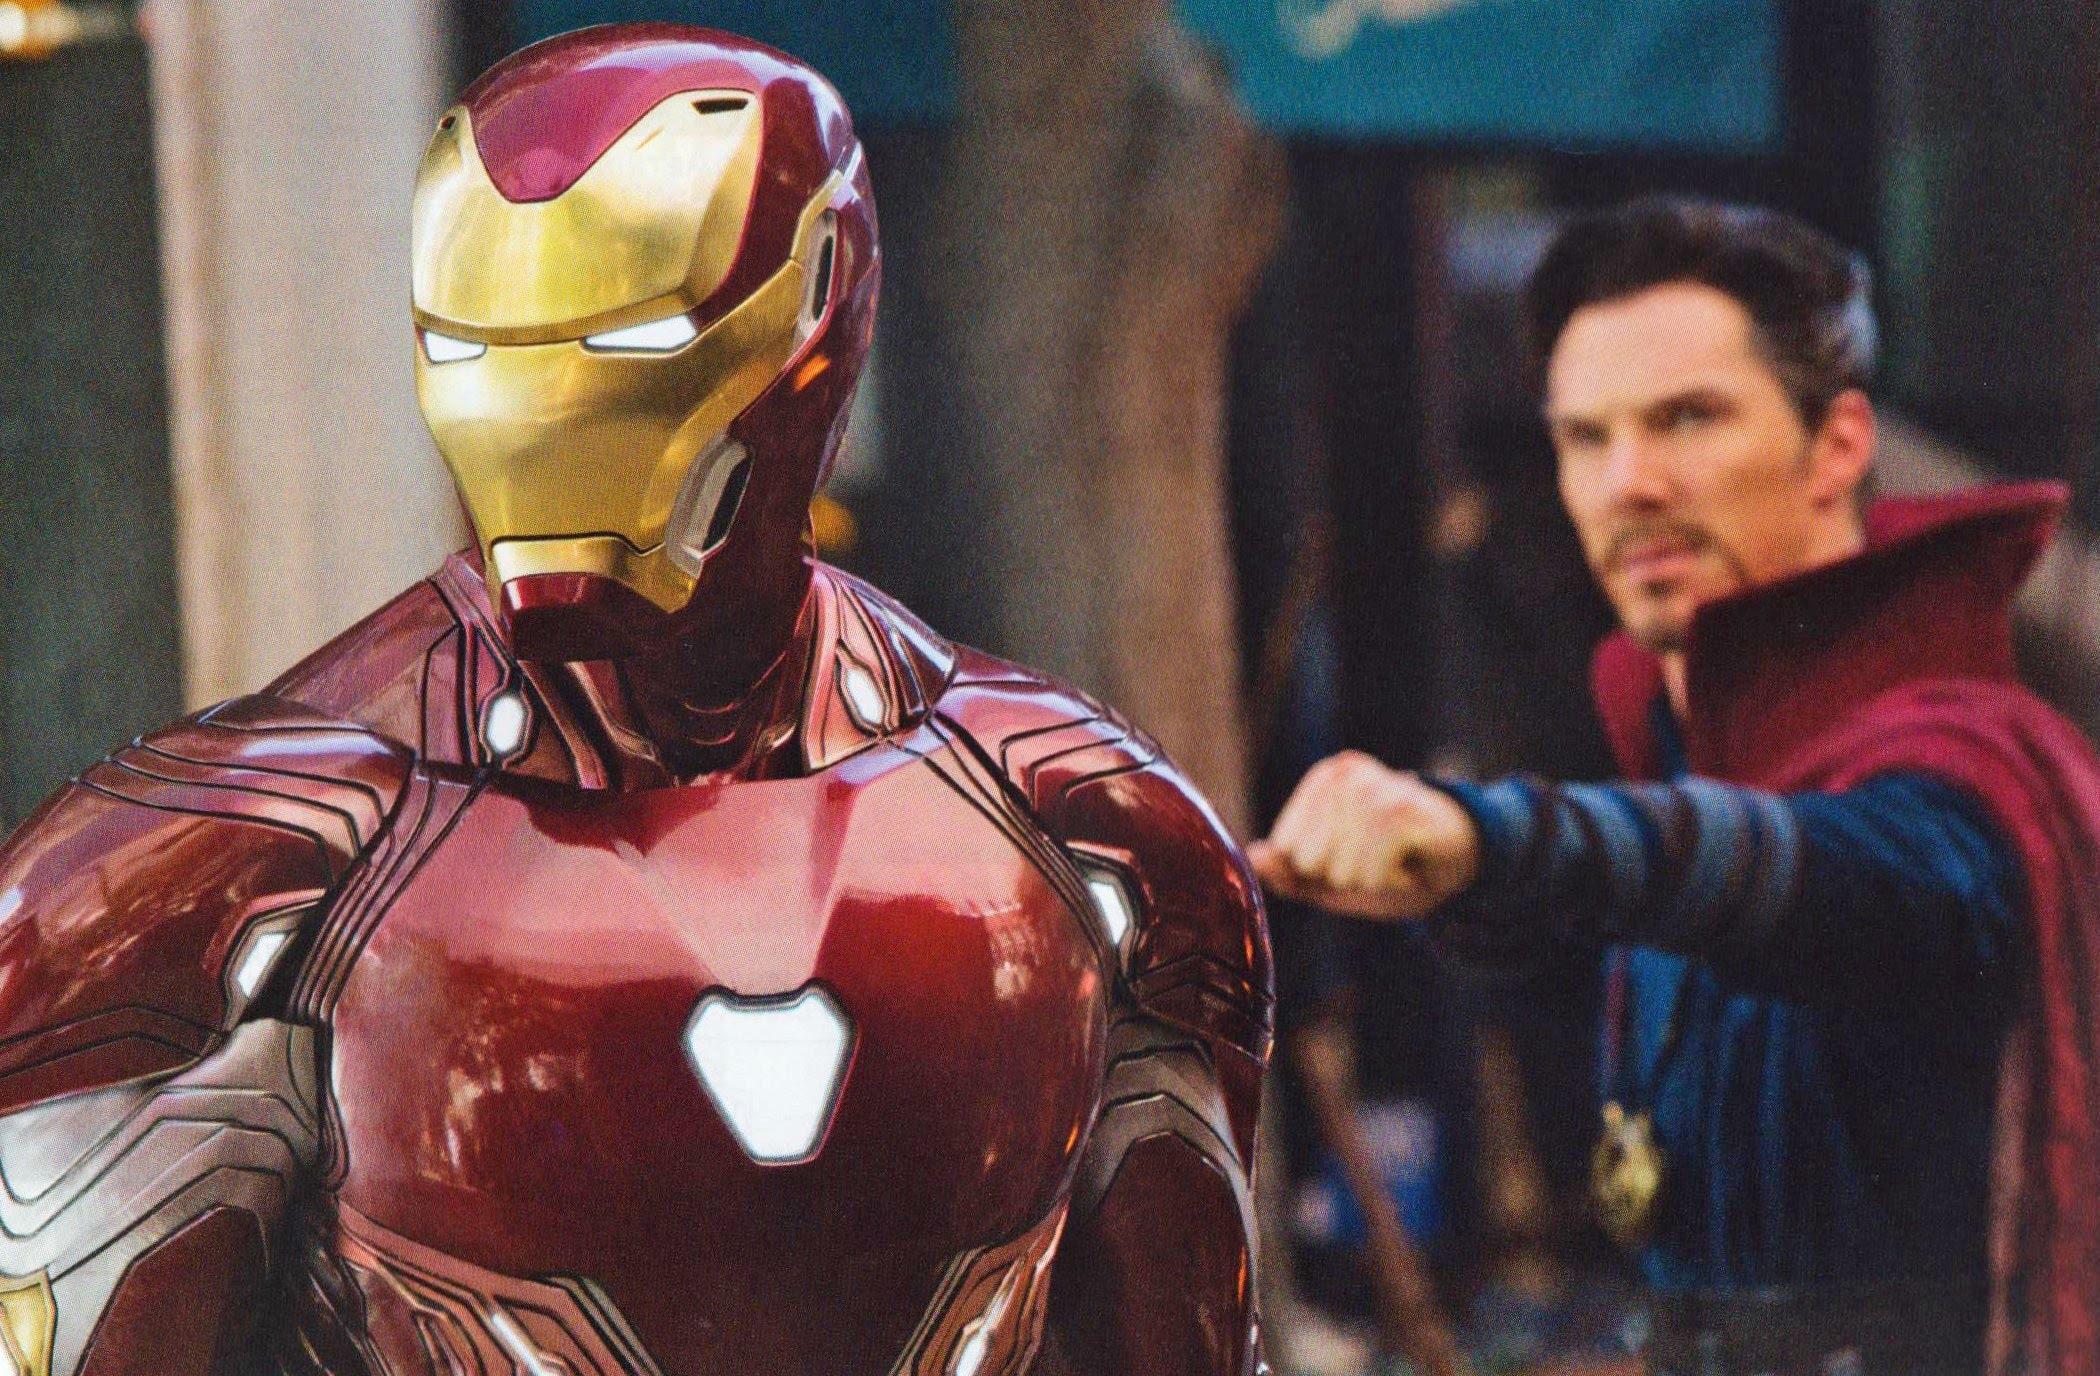 Avengers 4 trailer will come soon : ディズニー・マーベルが、ファンお待ちかねの「アベンジャーズ 4」の予告編を近日に初公開する可能性が浮上 ! !